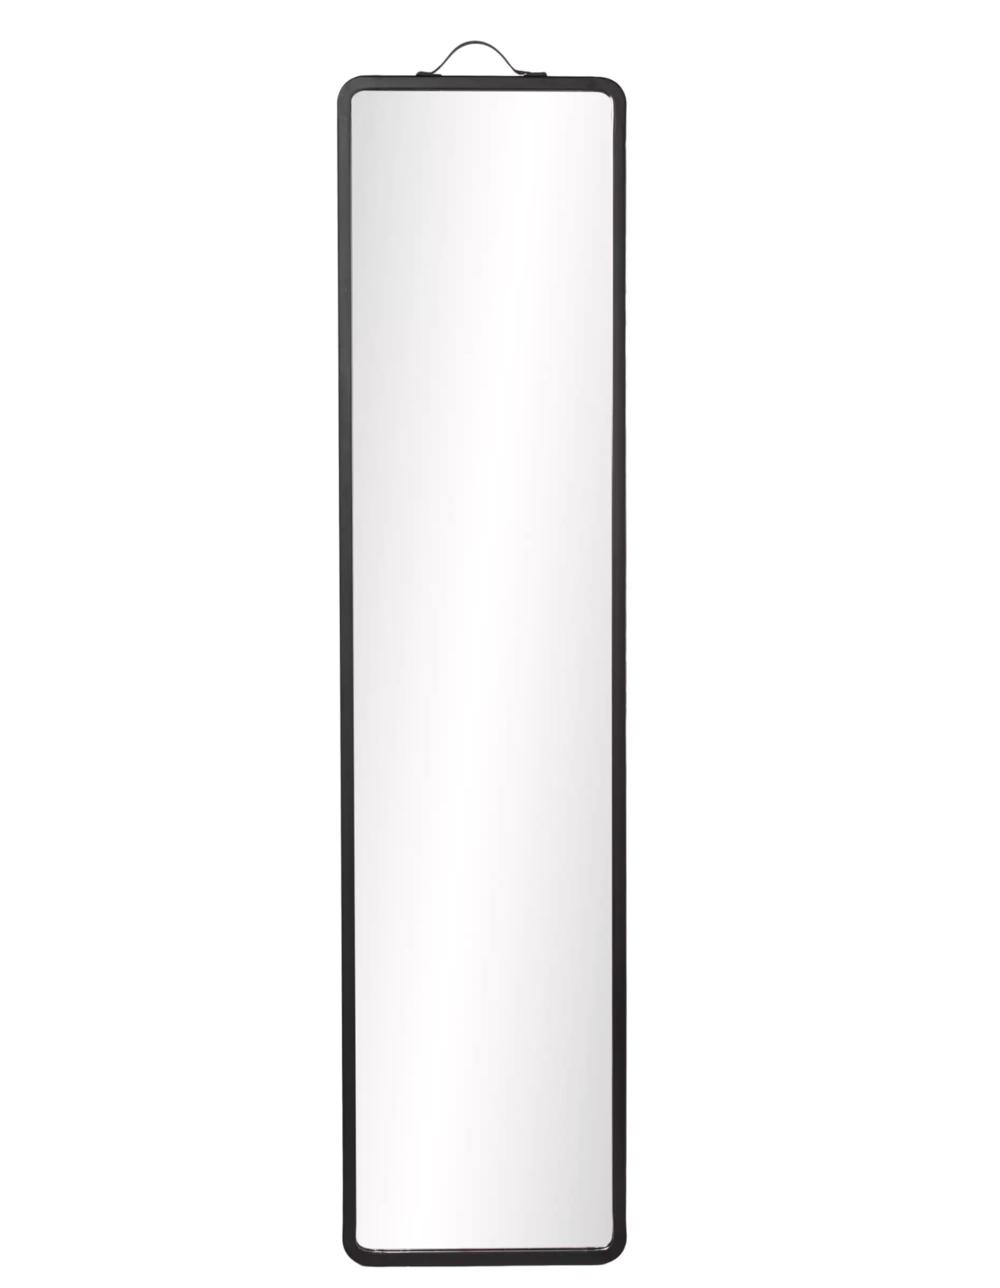 Copy of Copy of Copy of Copy of Overstock Floor Length Mirror